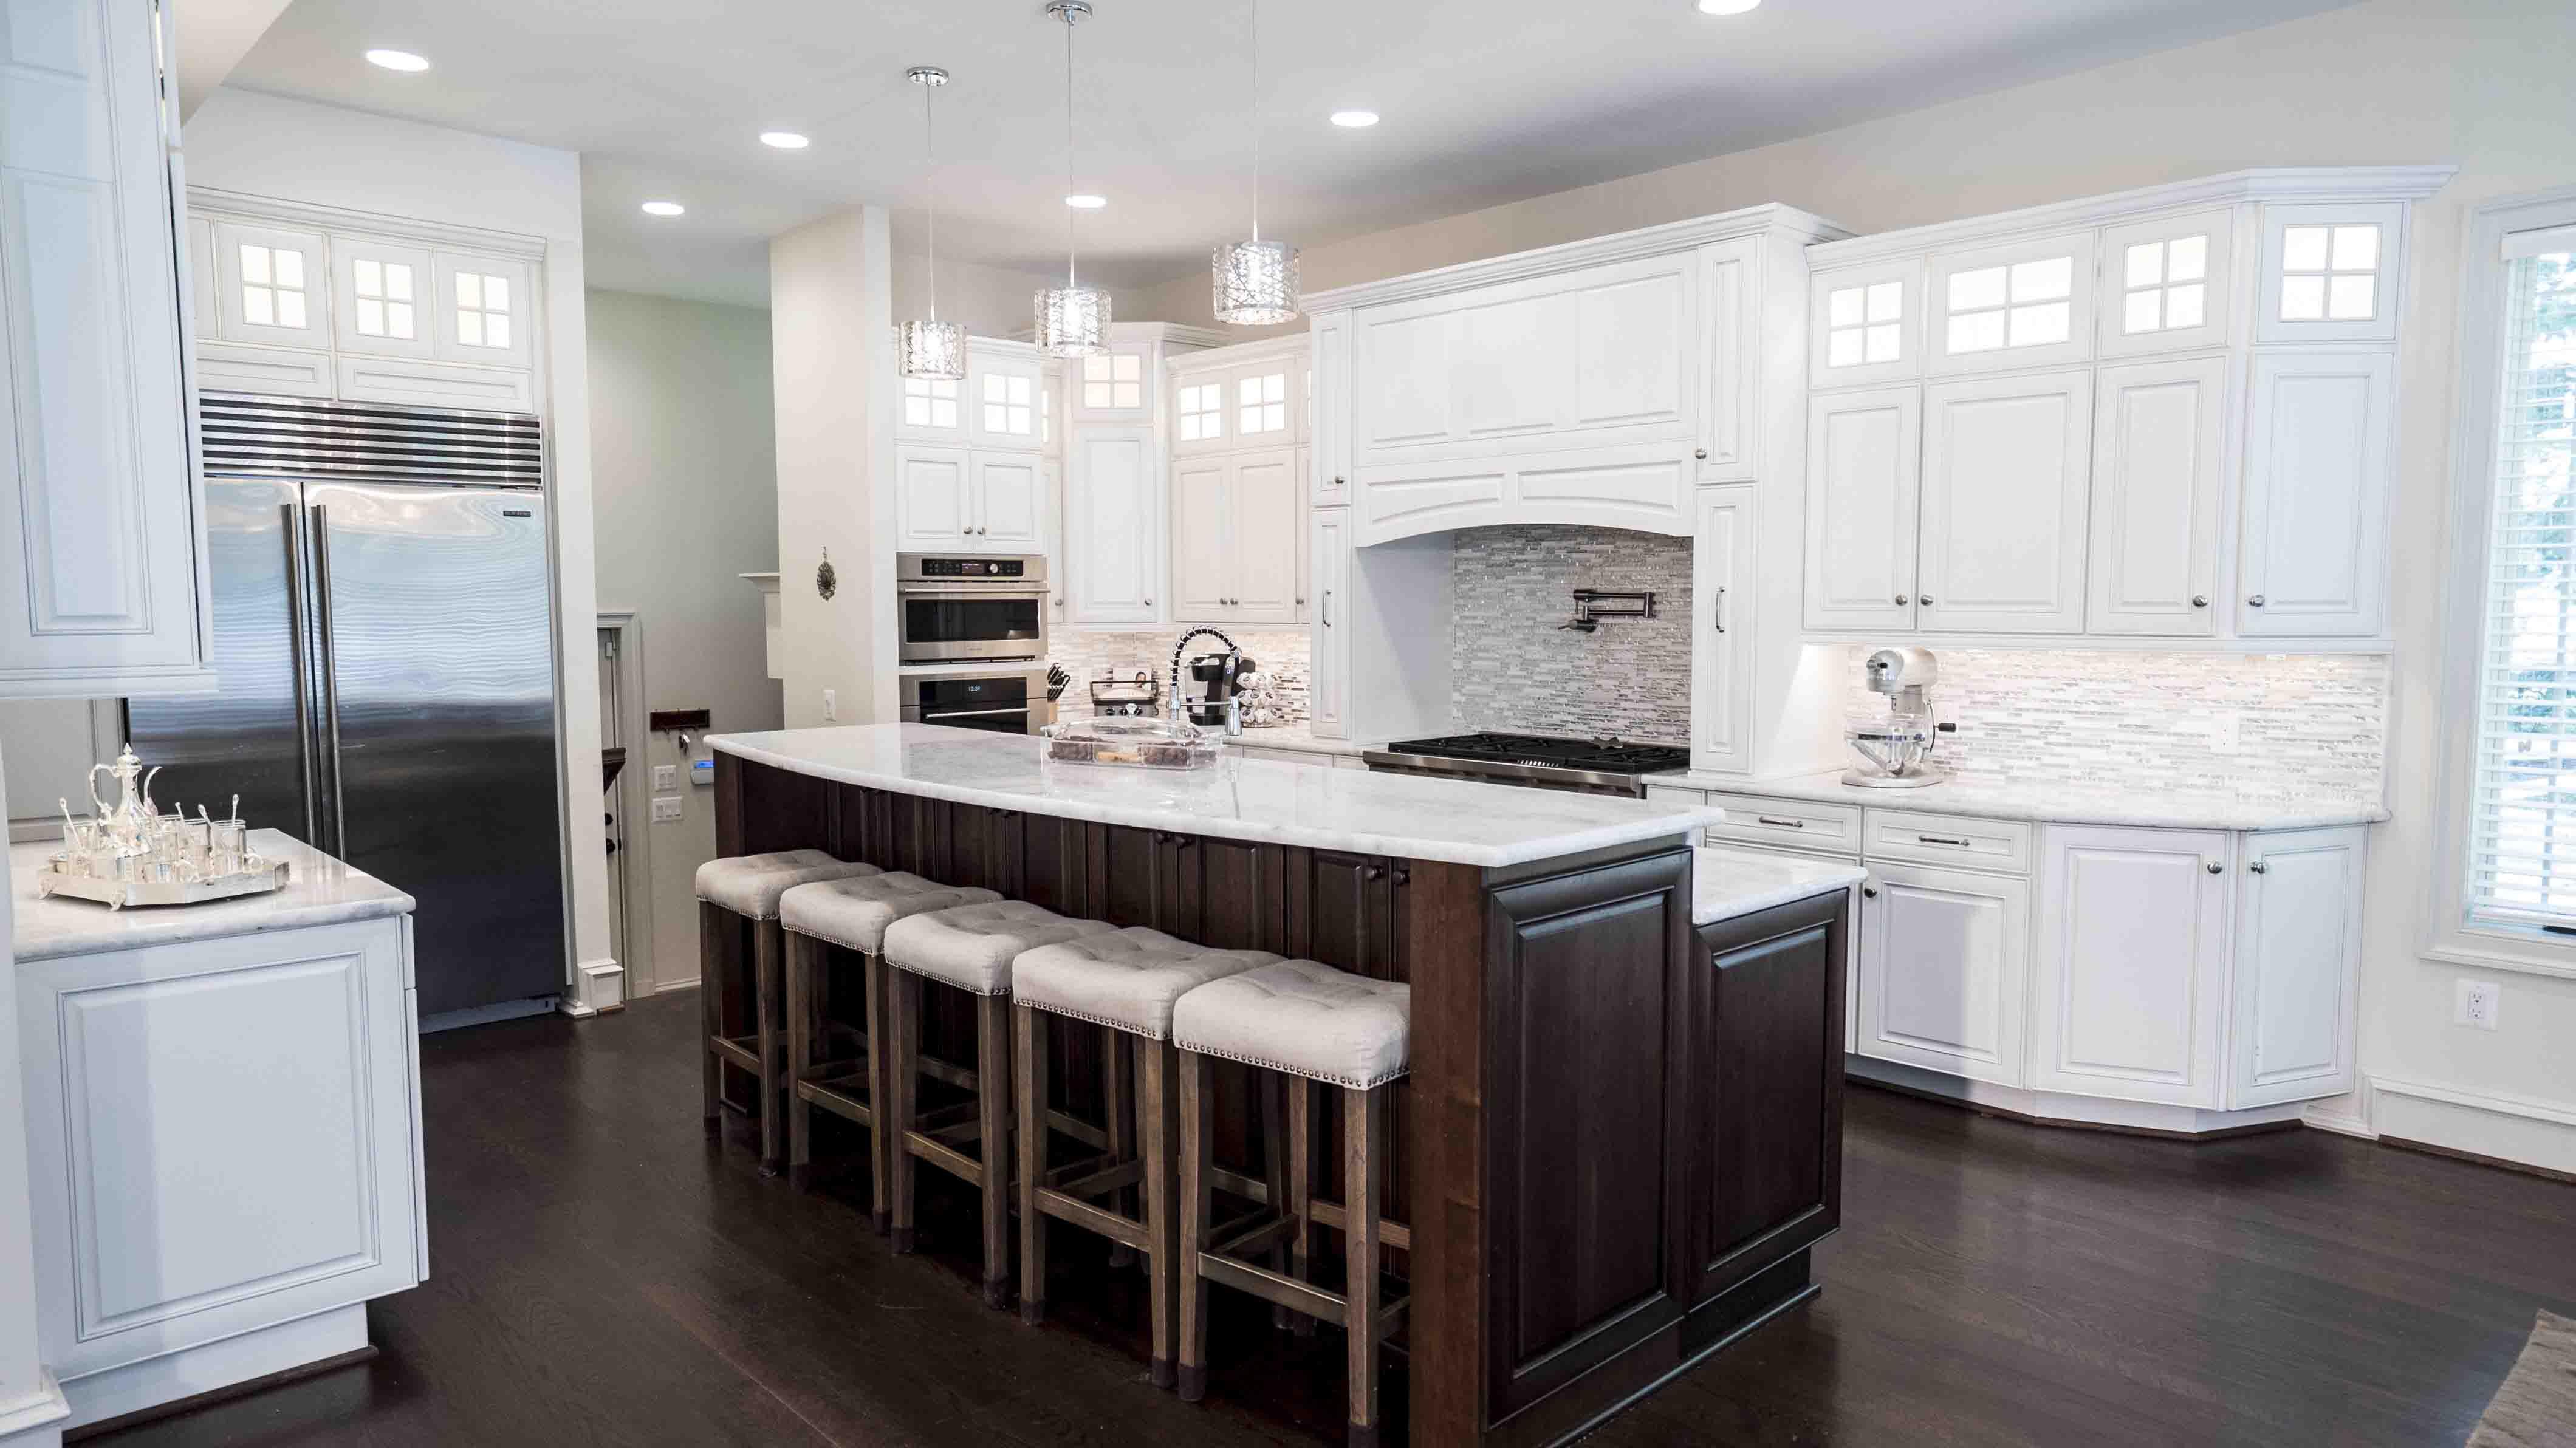 Kitchen Countertops in Washington DC • USA Marble & Granite